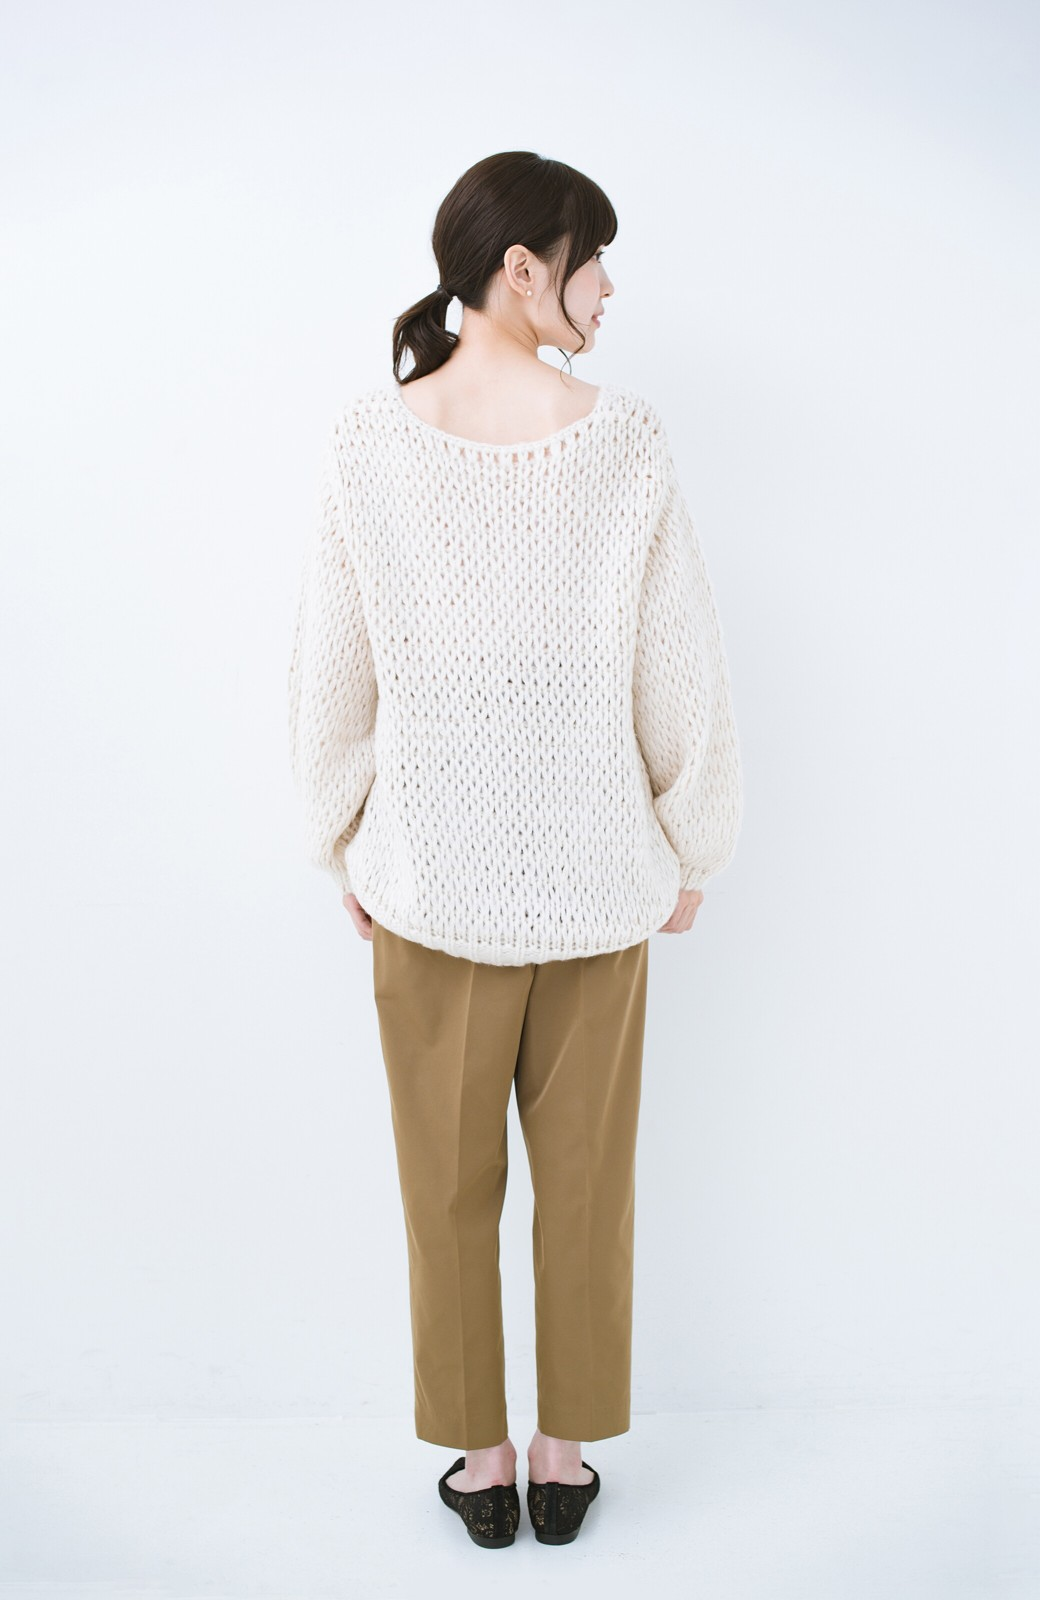 haco! 手編み風のざっくり感で女っぽい Vネックの甘編みルーズニット <アイボリー>の商品写真10